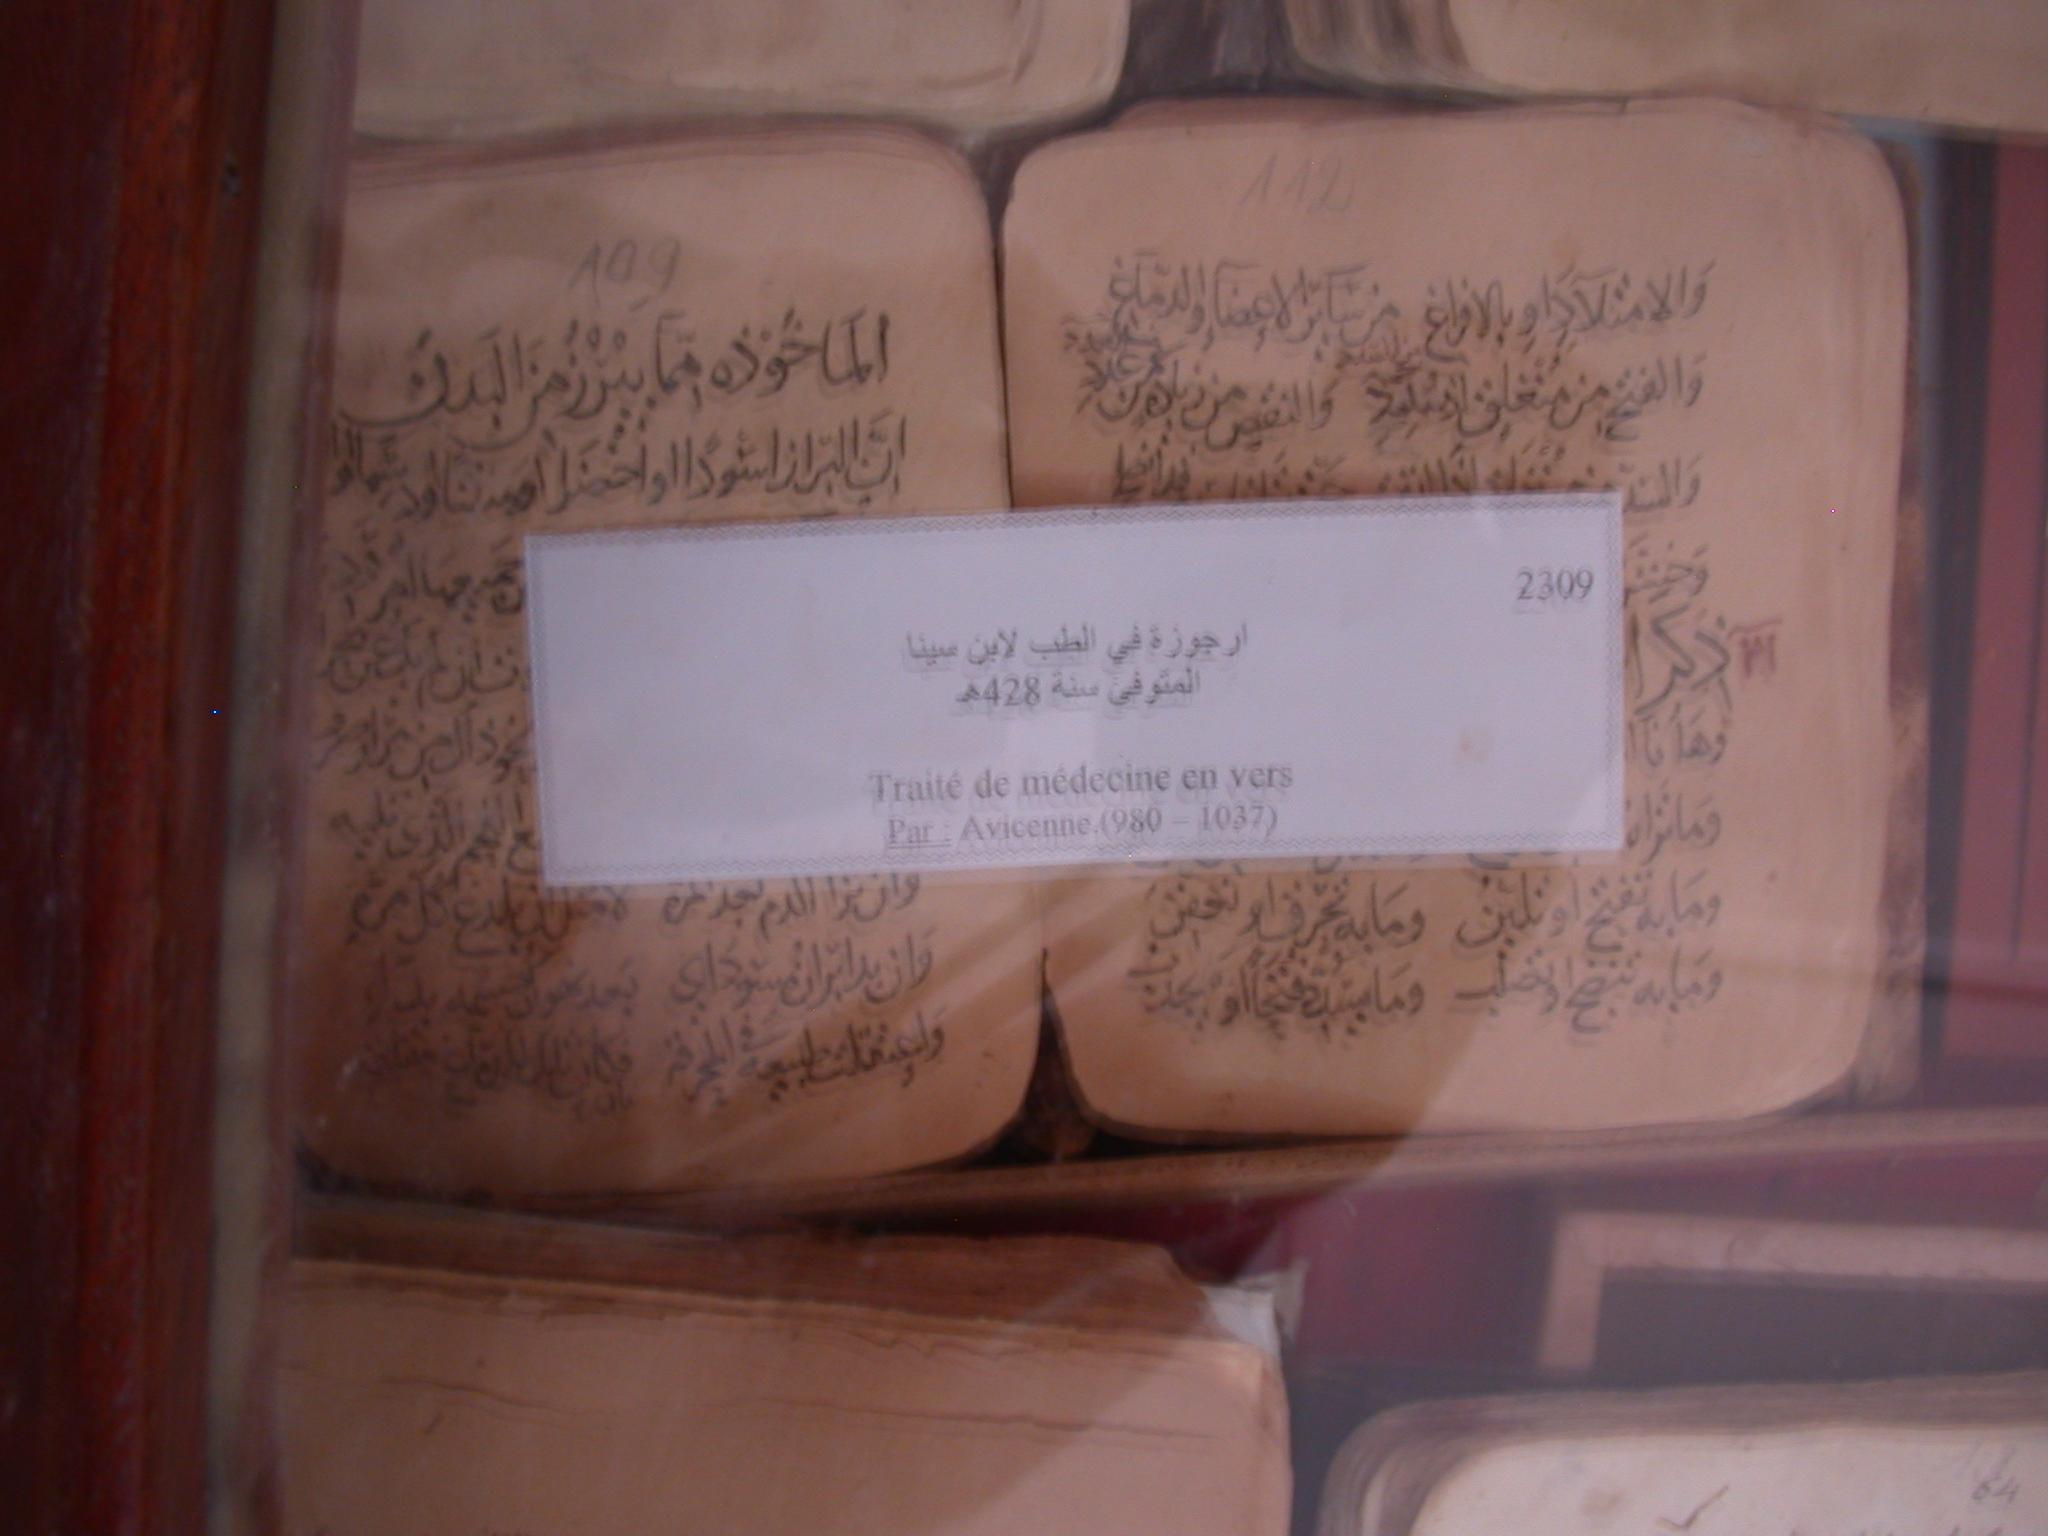 Manuscript, Medical Treatise in Verse, Ahmed Baba Institute, Institut des Hautes Etudes et de Recherches Islamiques, Timbuktu, Mali